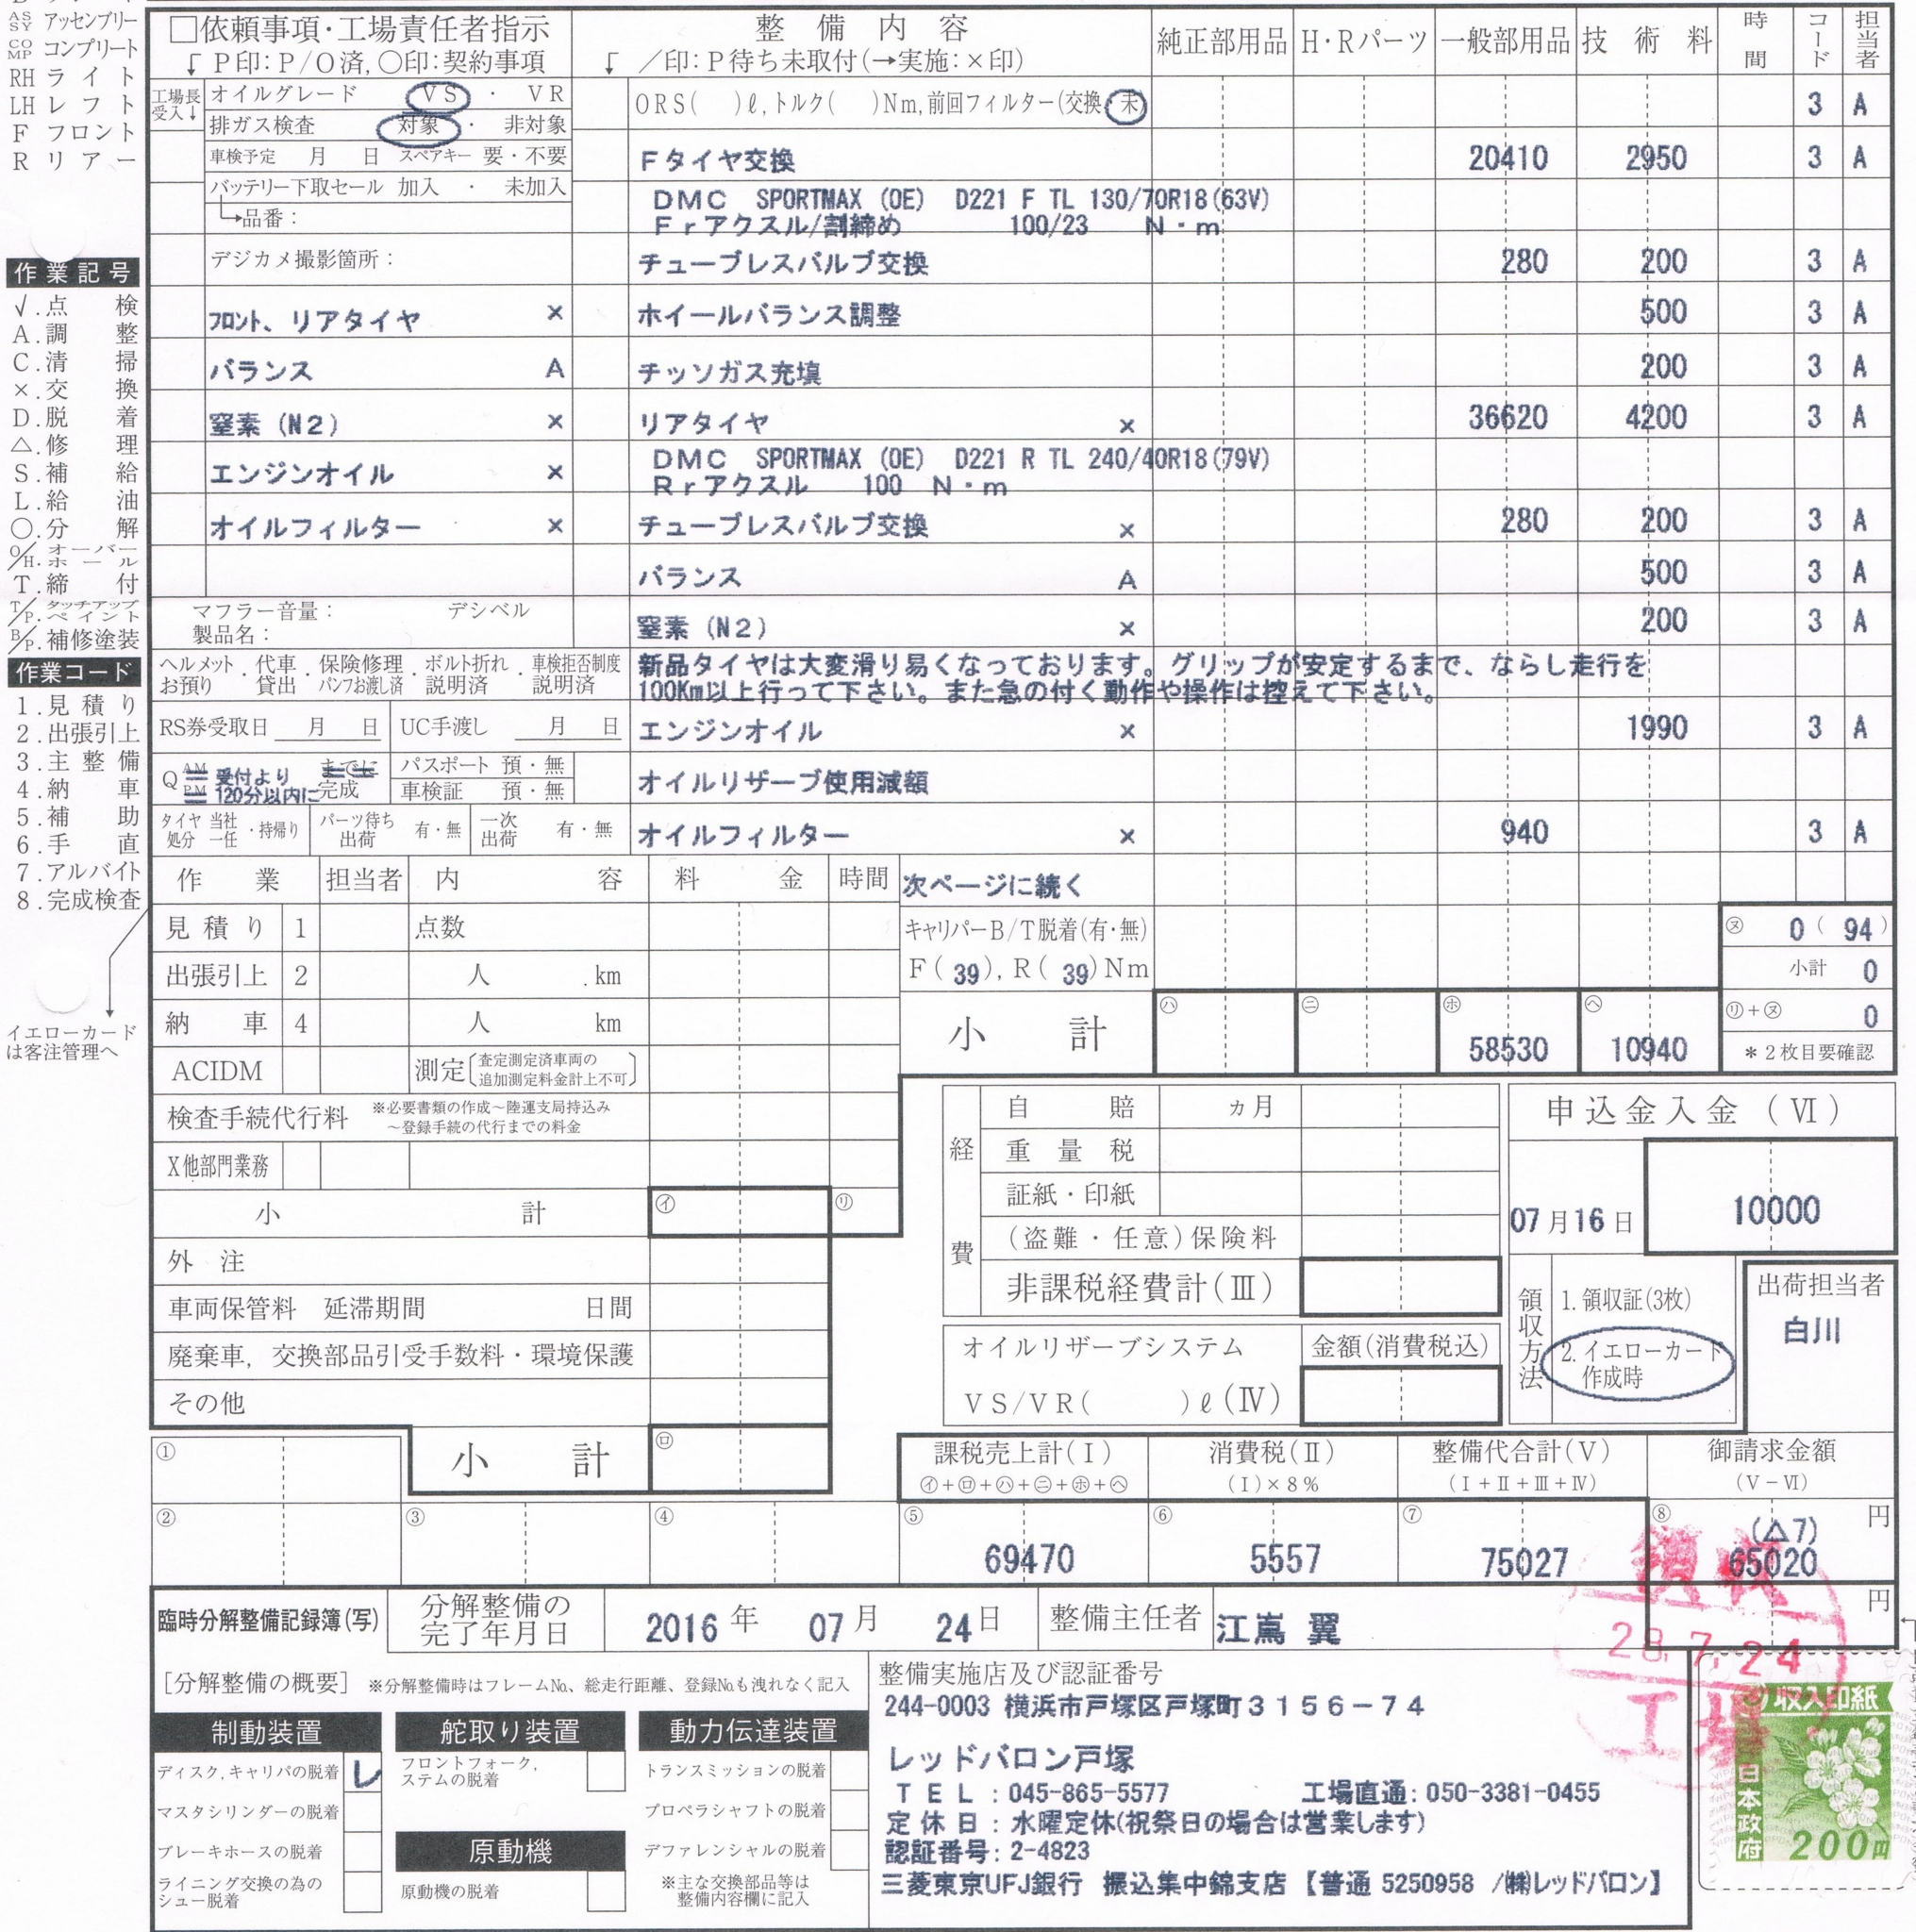 f:id:ToshUeno:20160724192146j:plain